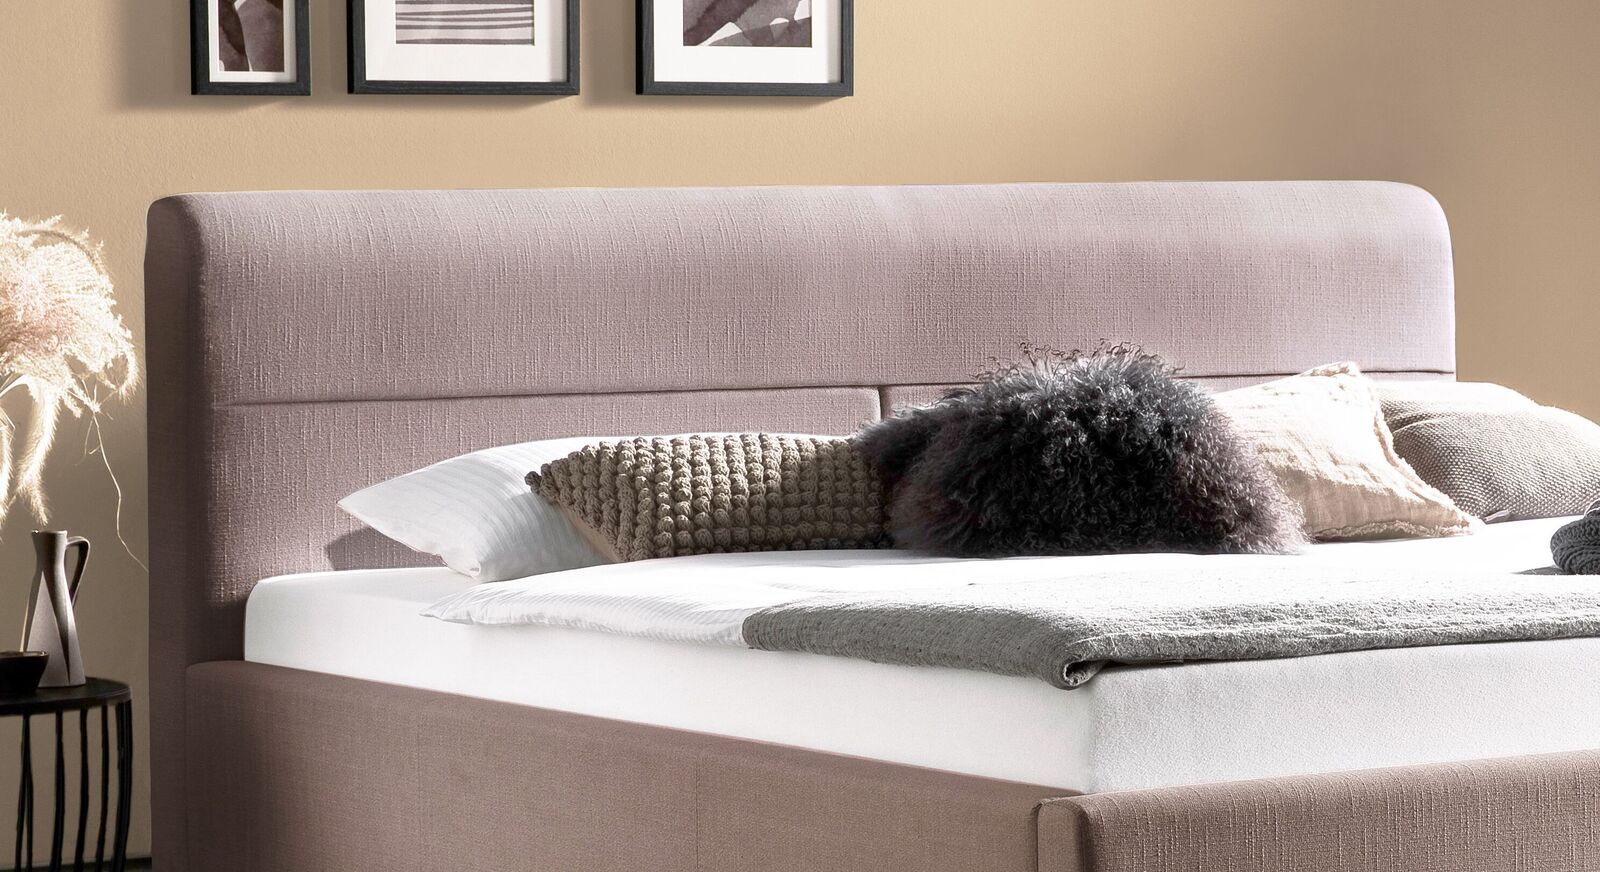 Bett Roneas Kopfteil mit stilvoller Steppung